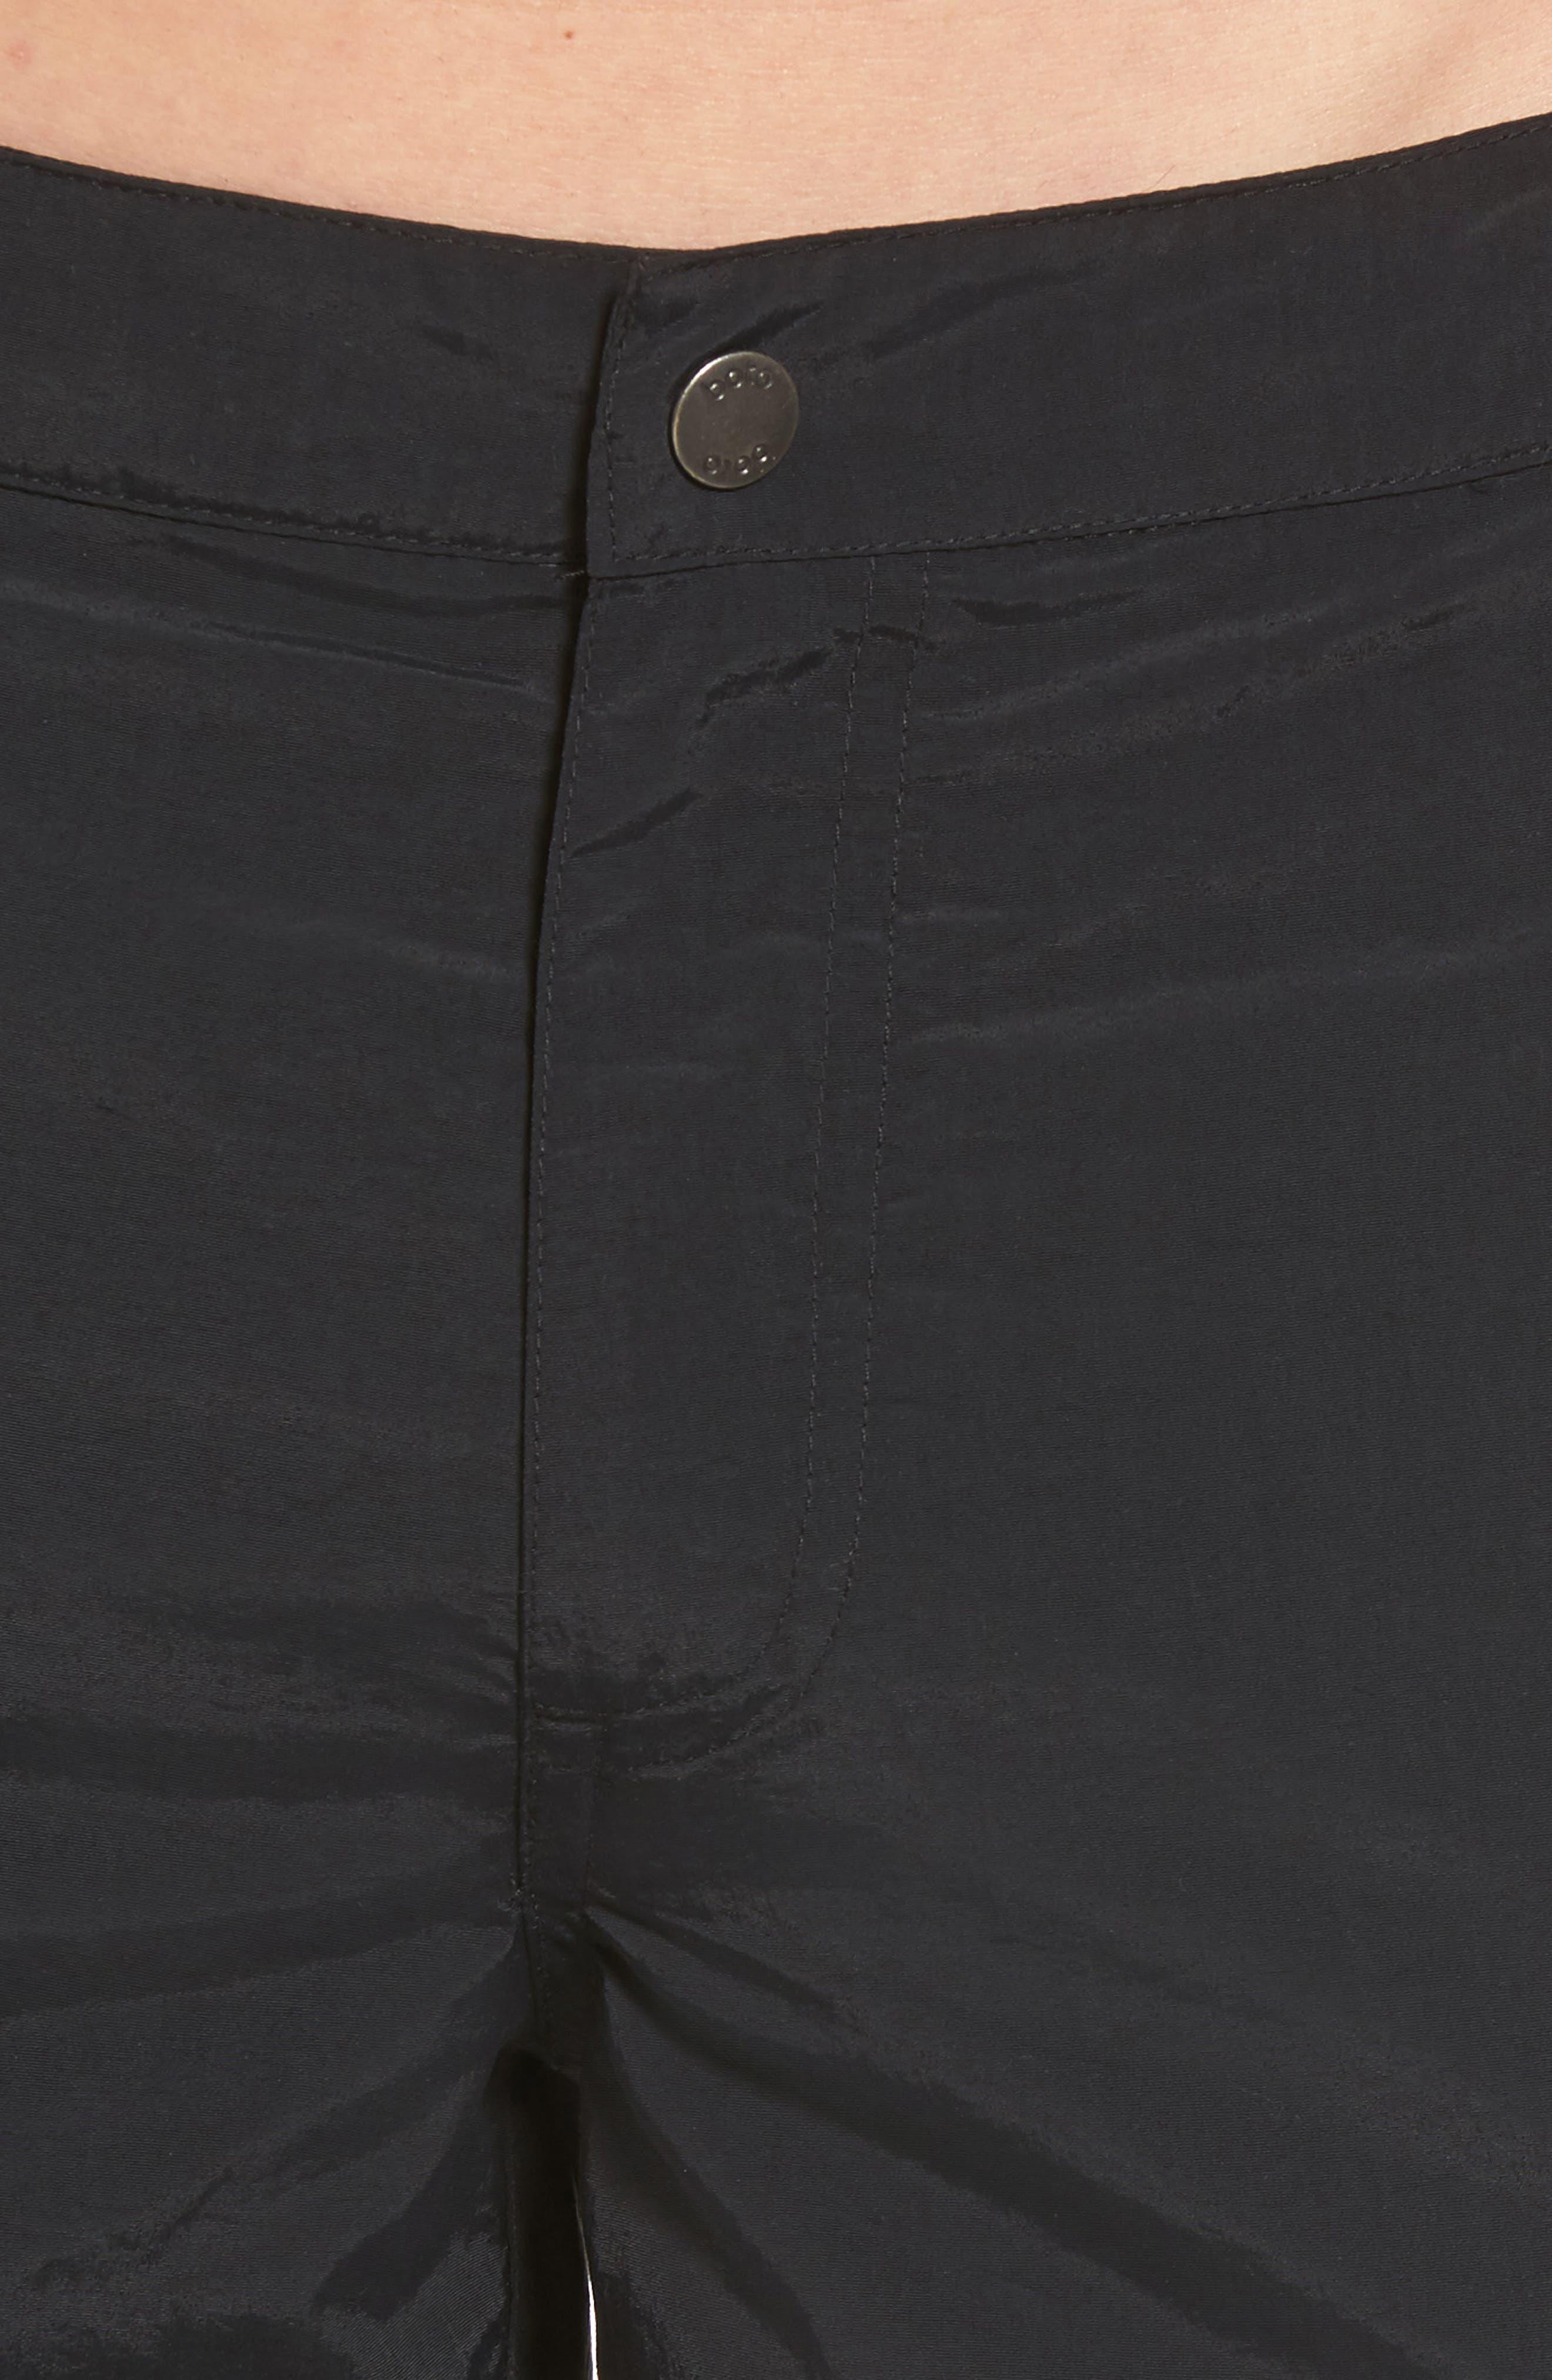 'Aruba - Island' Tailored Fit 8.5 Inch Board Shorts,                             Alternate thumbnail 4, color,                             001